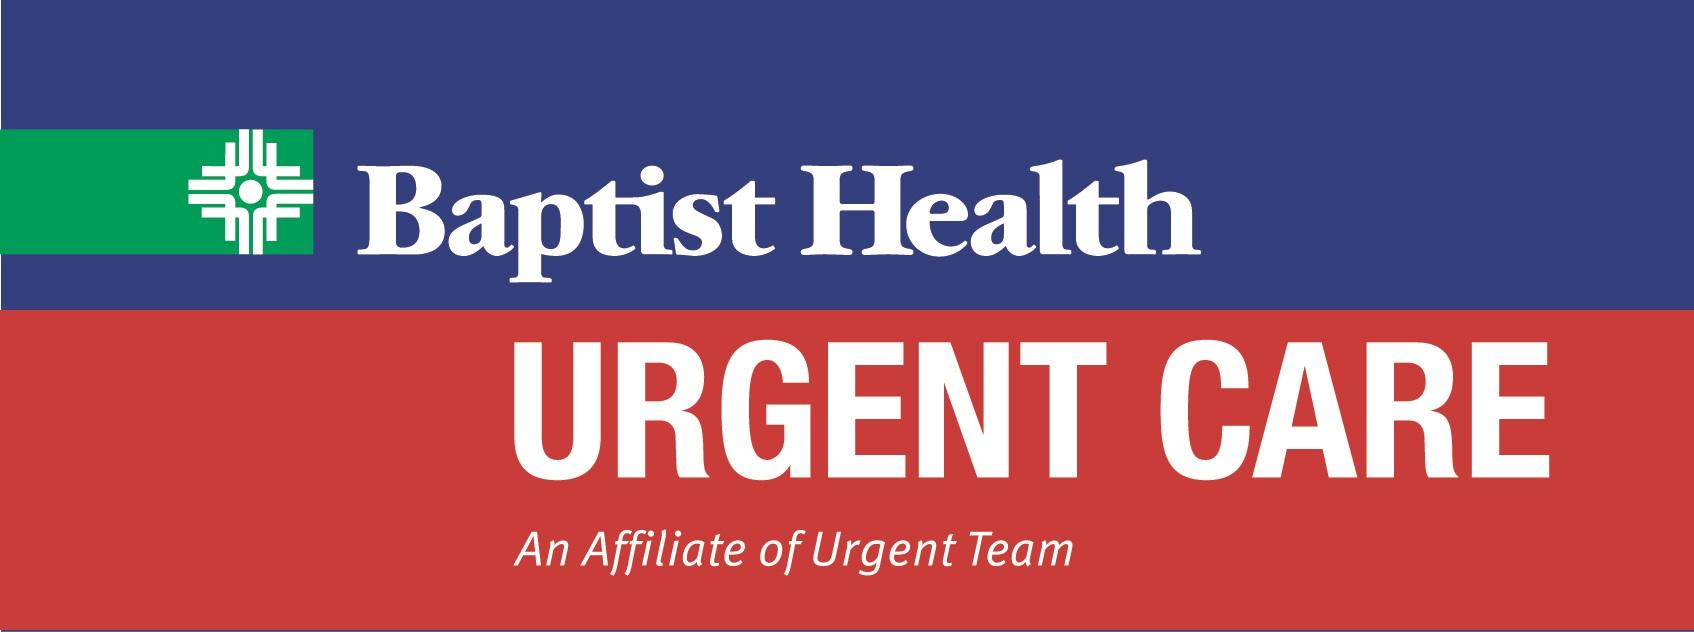 Baptist Health Urgent Care - Fort Smith Logo